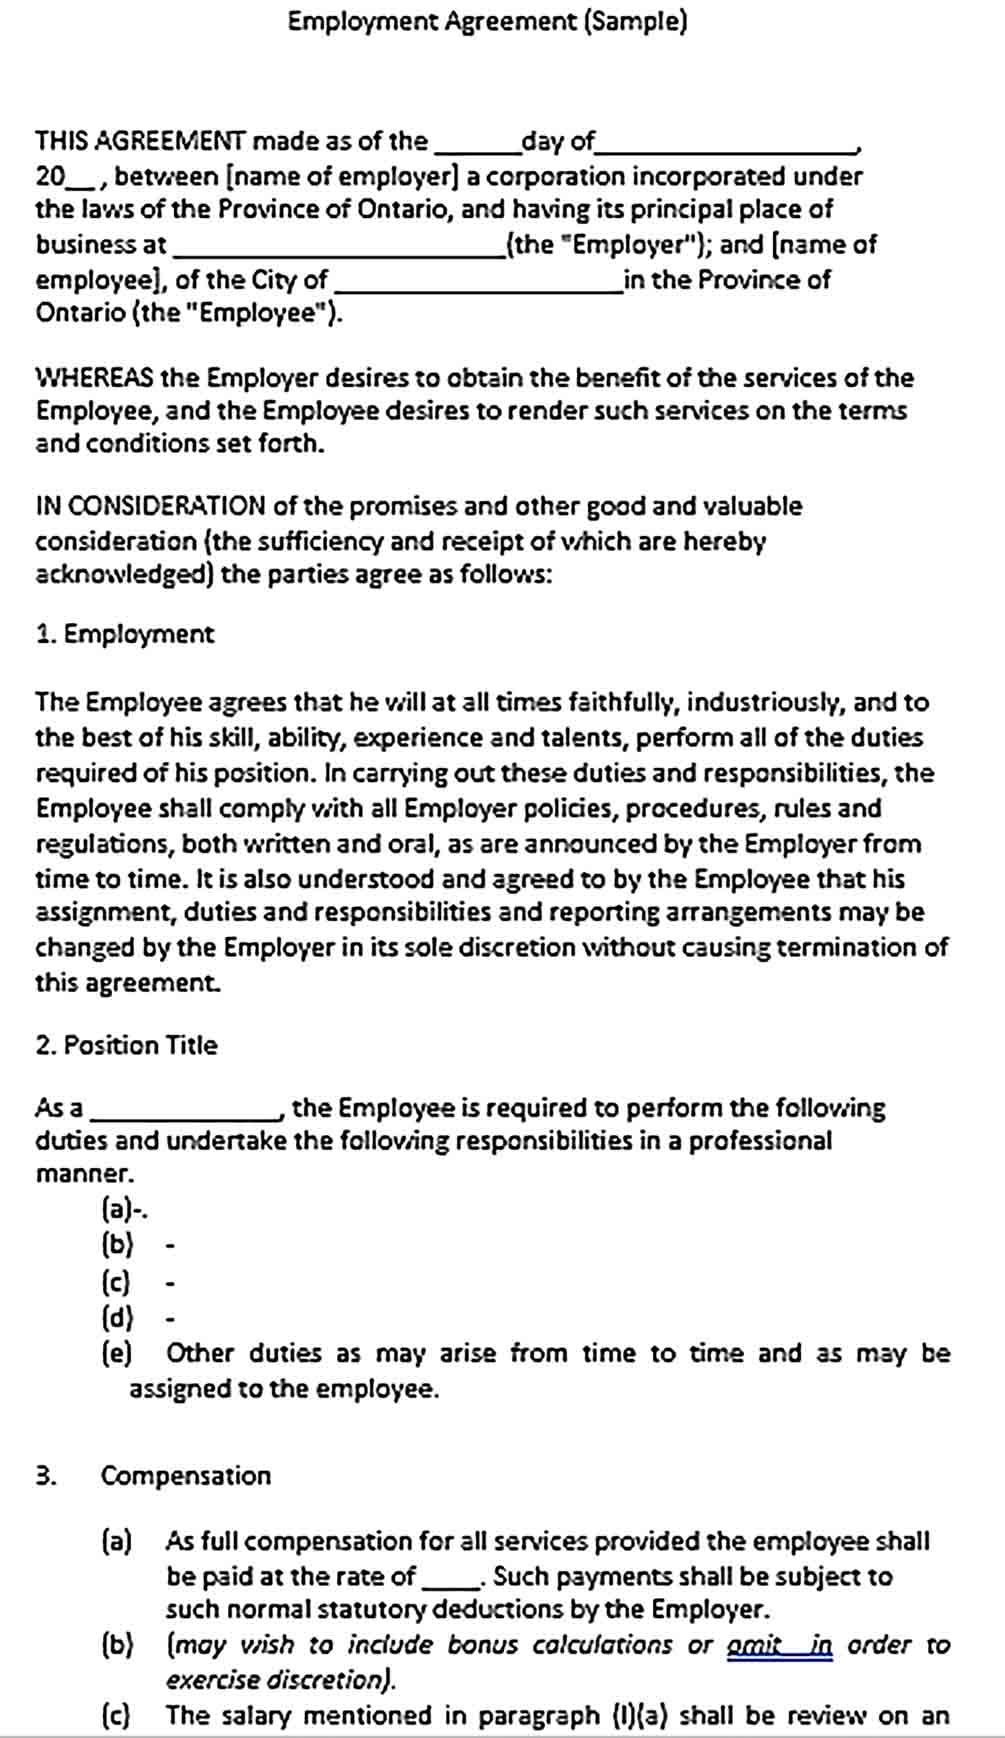 Sample Compensation Agreement Templates Business Template Compensation Templates